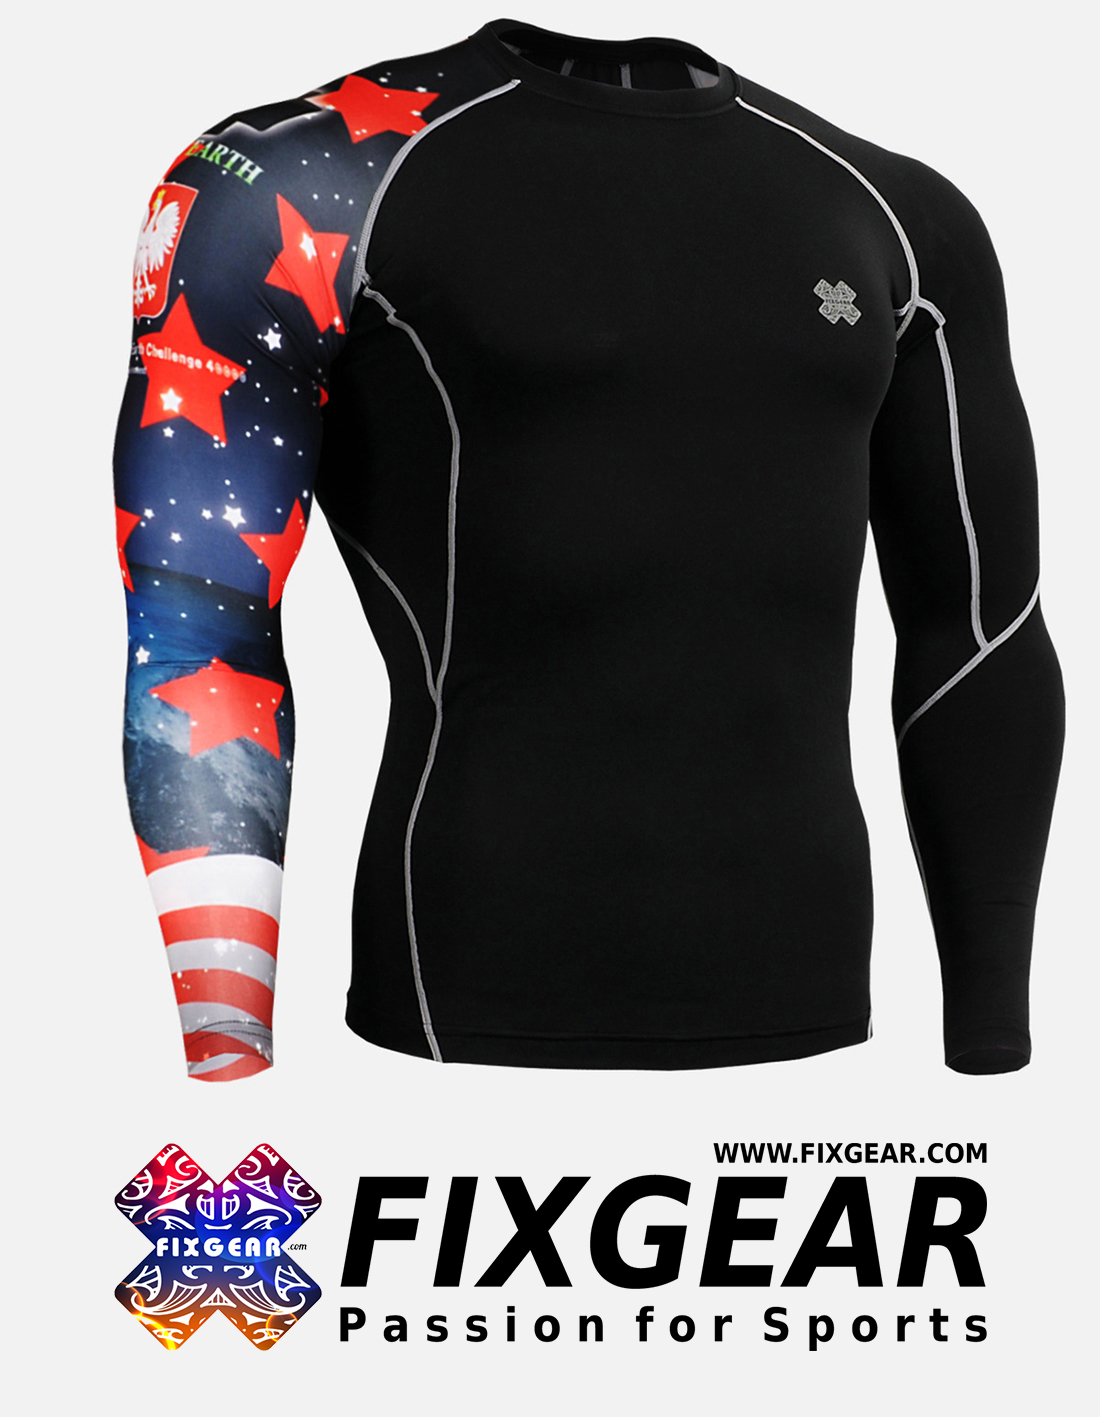 FIXGEAR CP-B10 Compression Base Layer Shirt